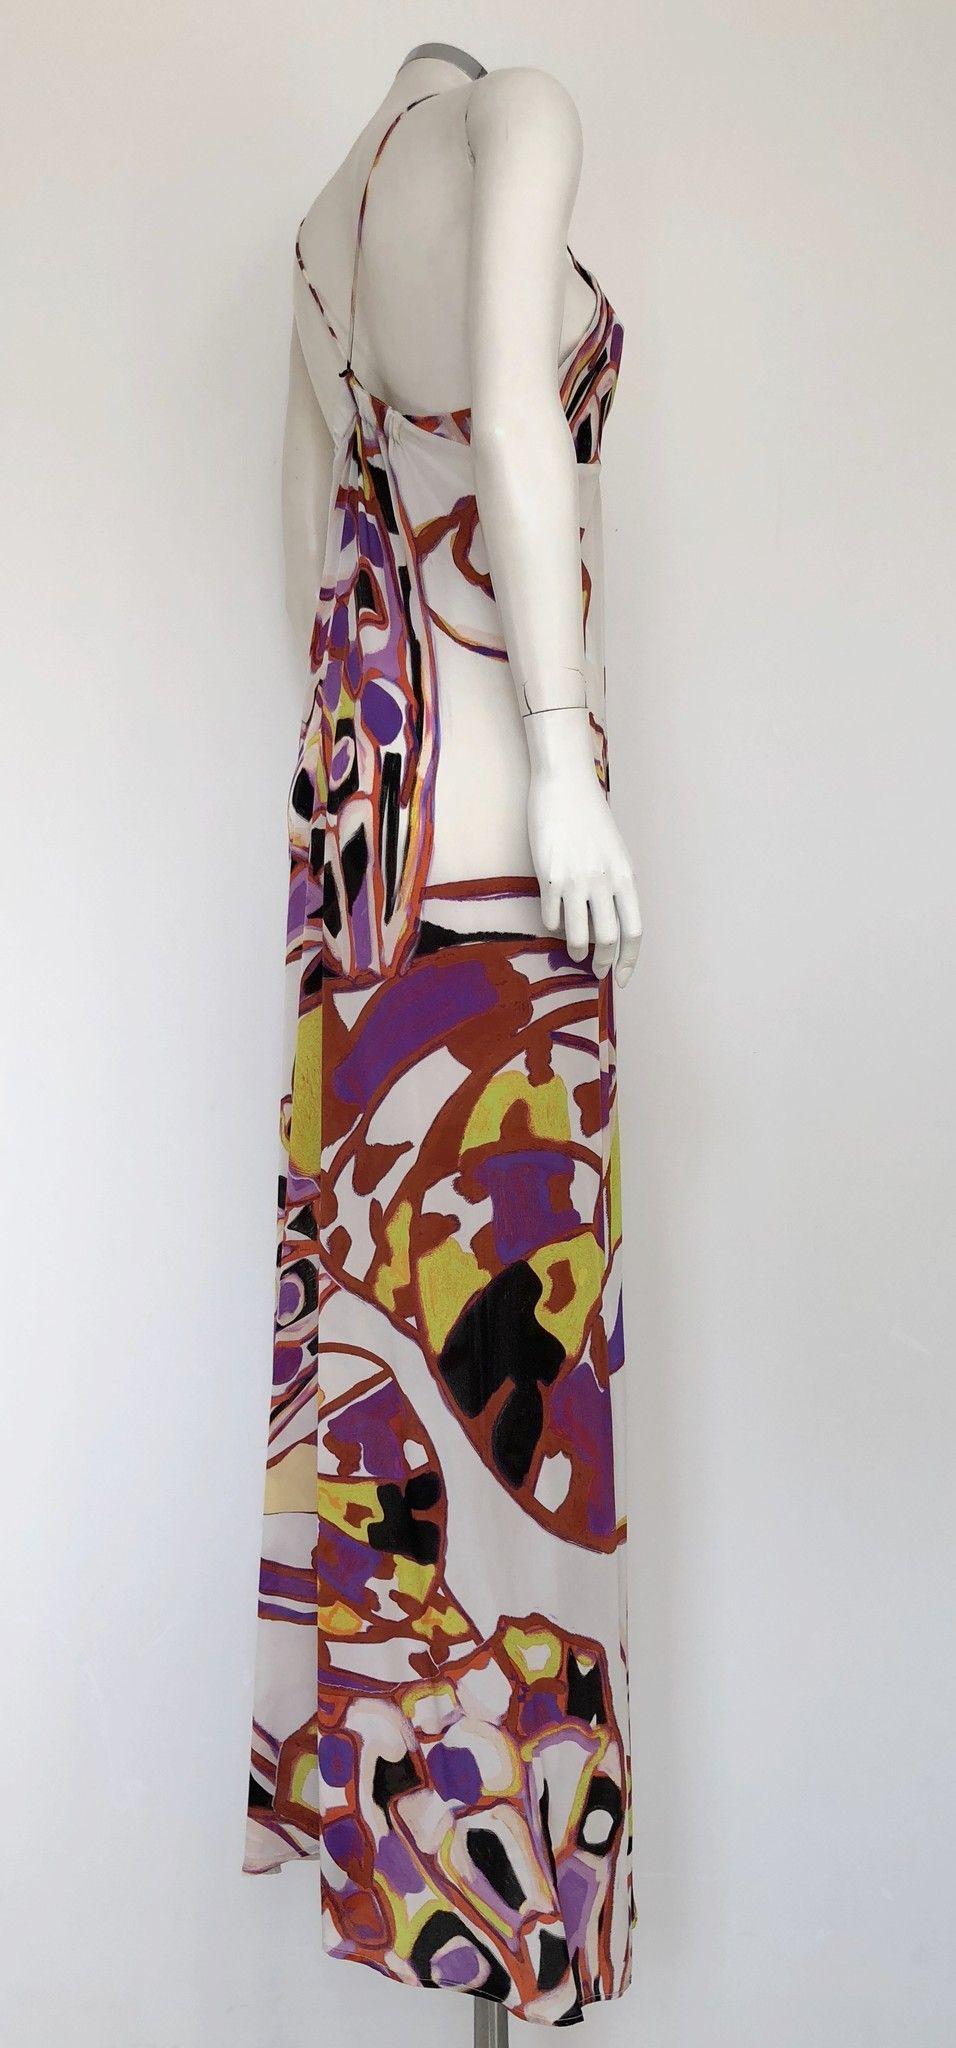 Adele Fado Long Dress in Floral Design Cod.79984